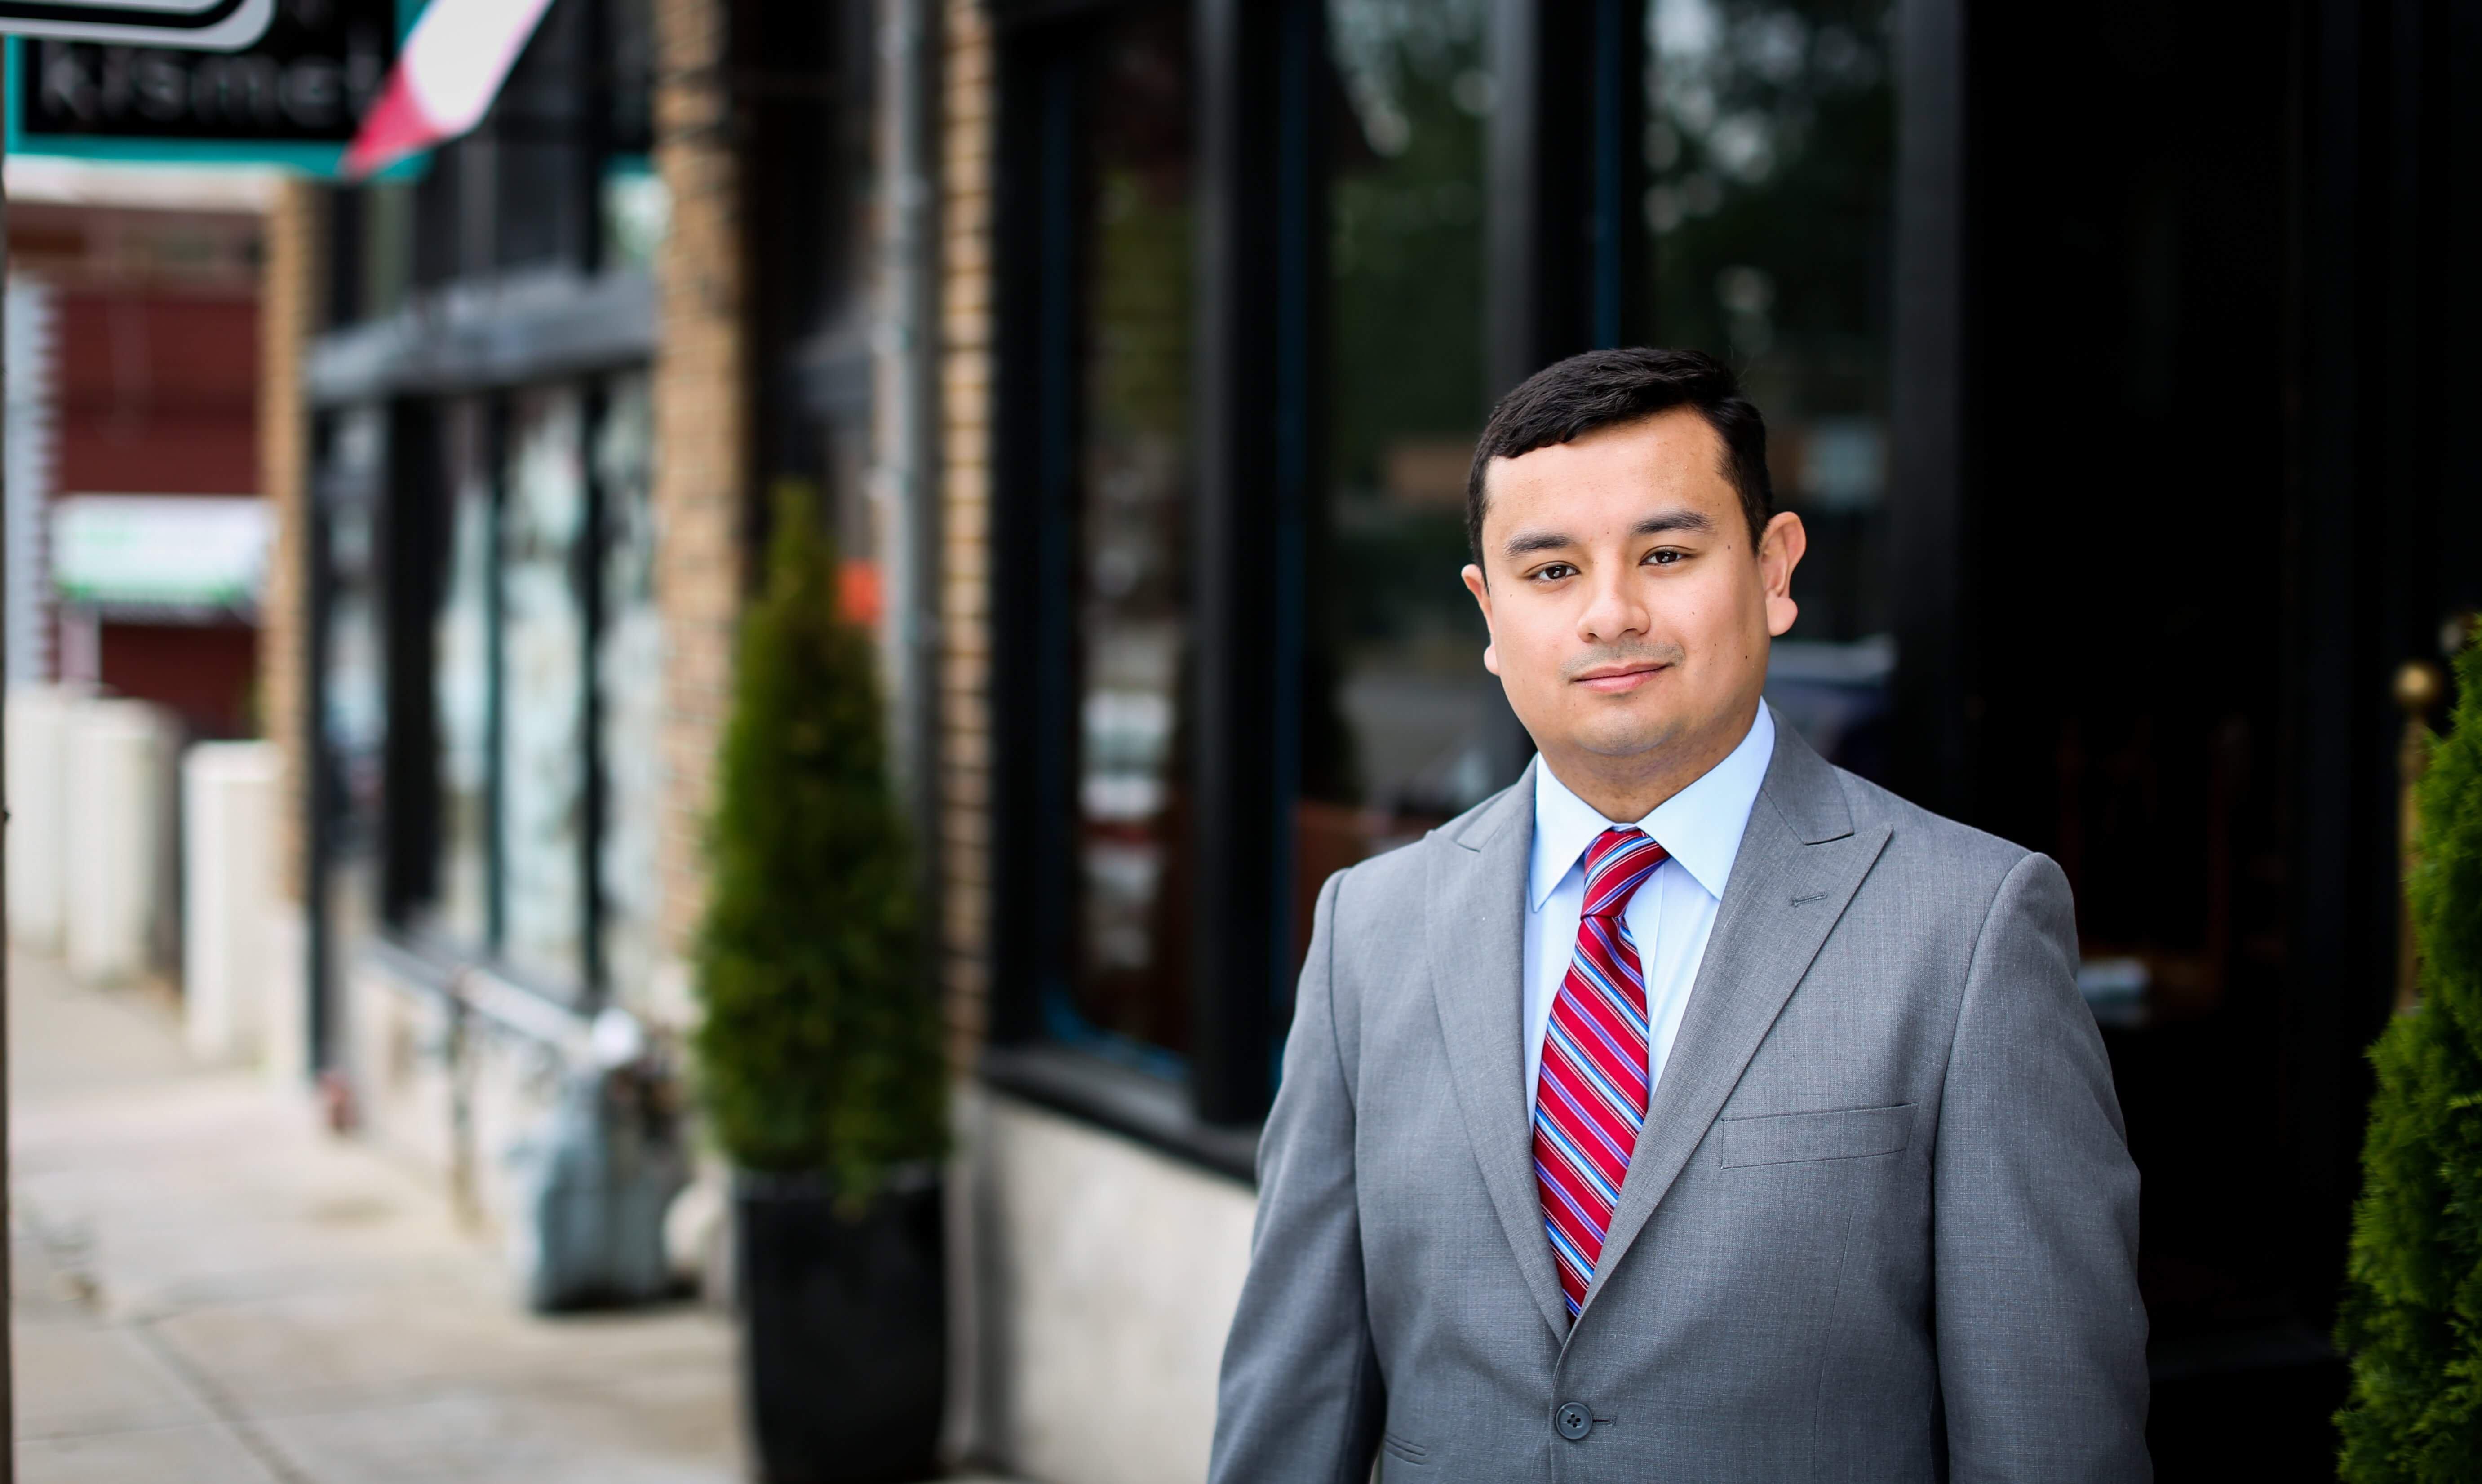 Attorney Matt Robertson